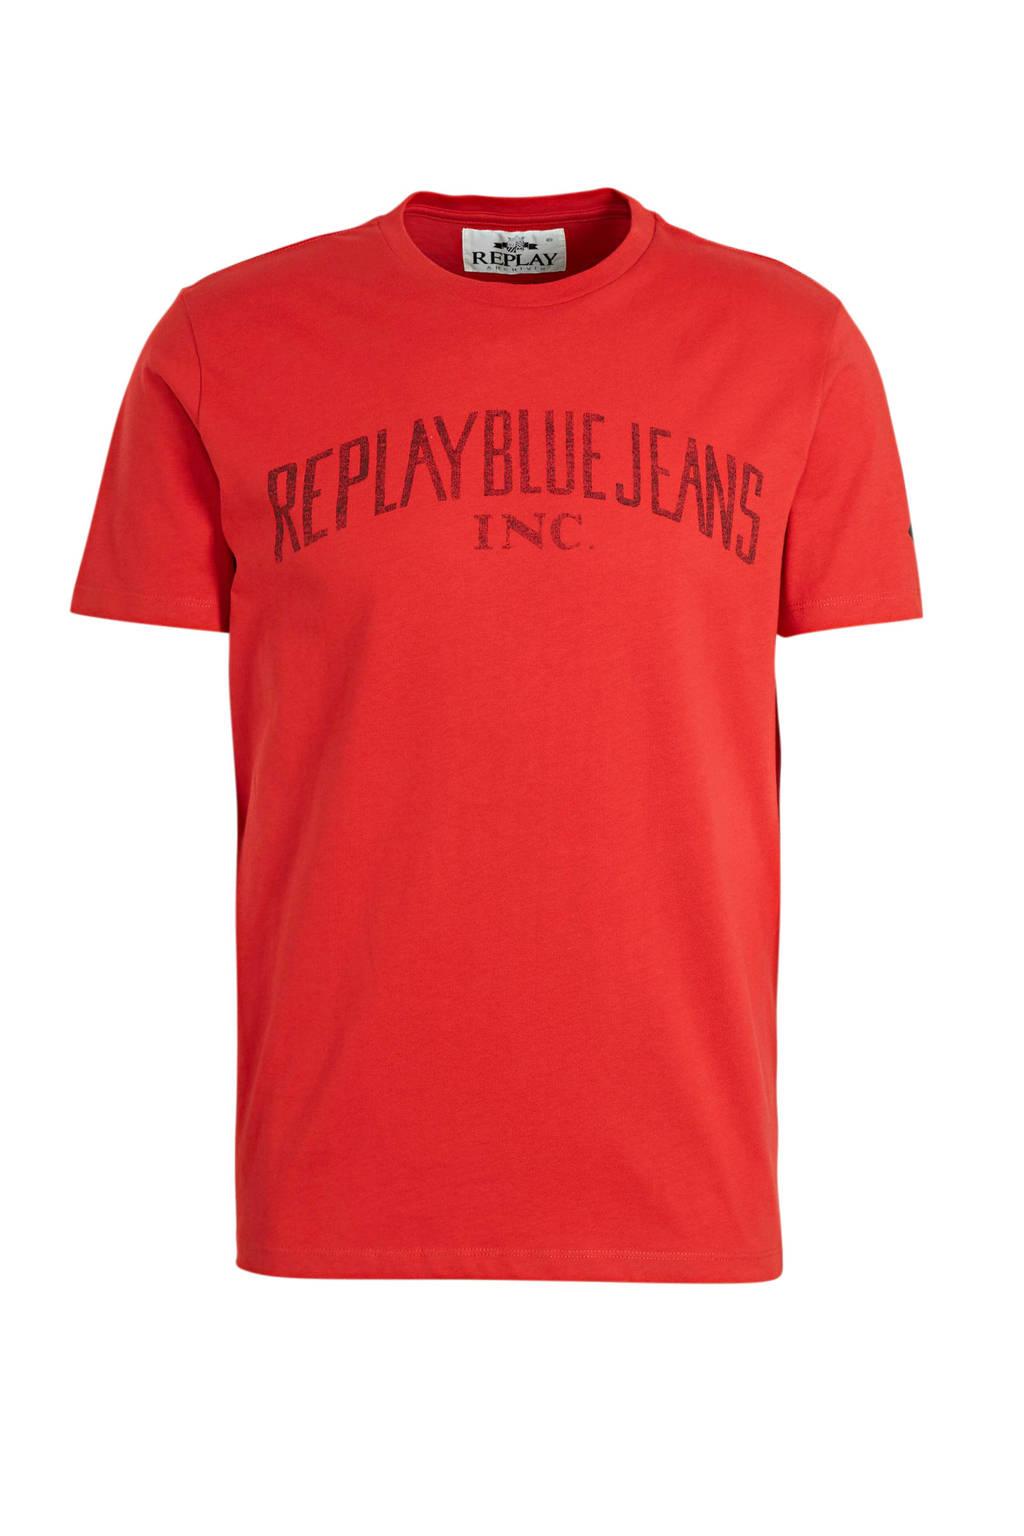 REPLAY T-shirt met logo rood, Rood